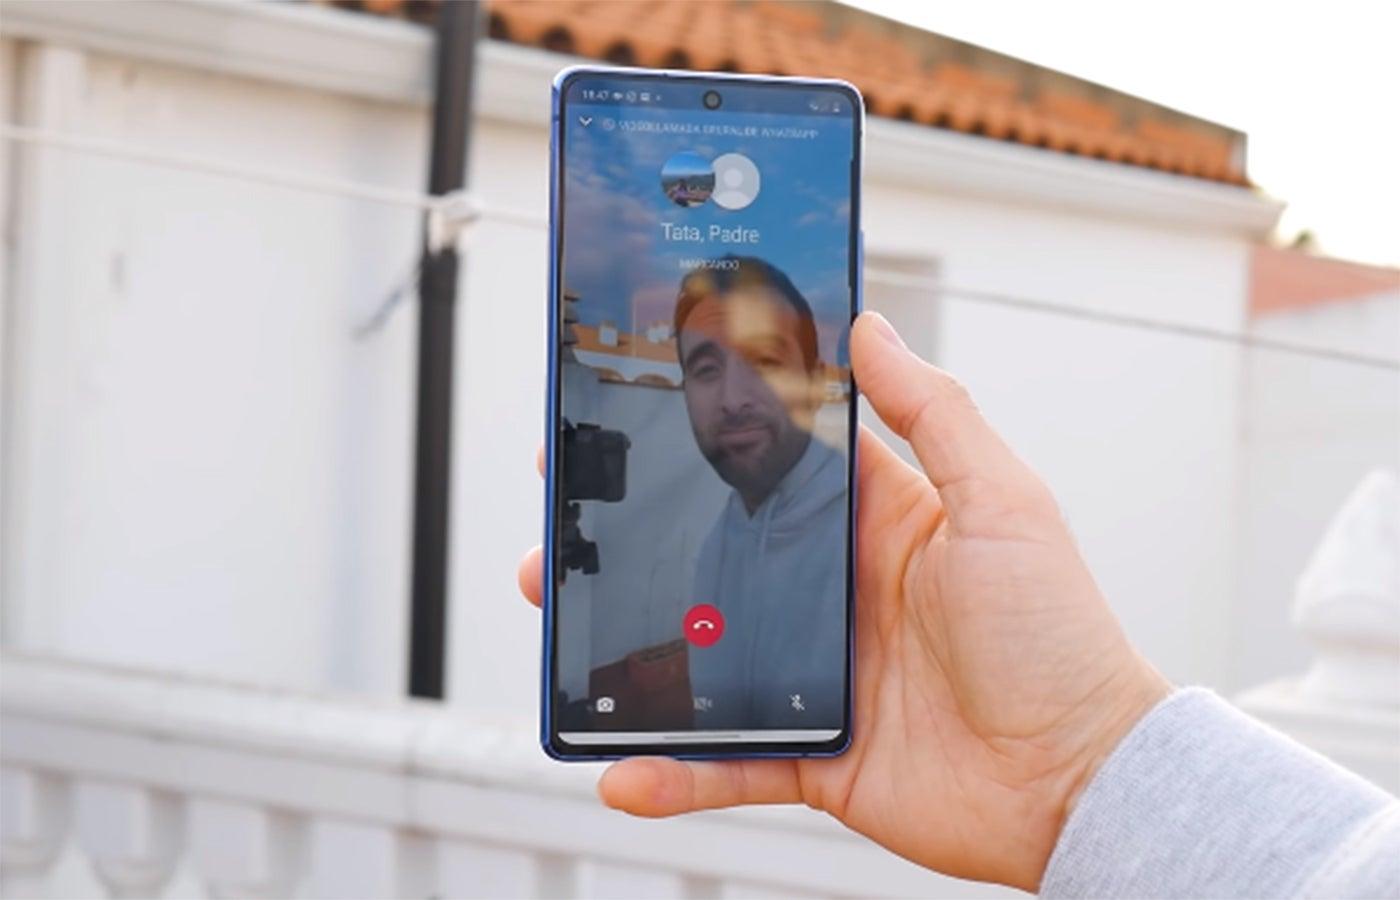 WhatsApp-Videoanruf